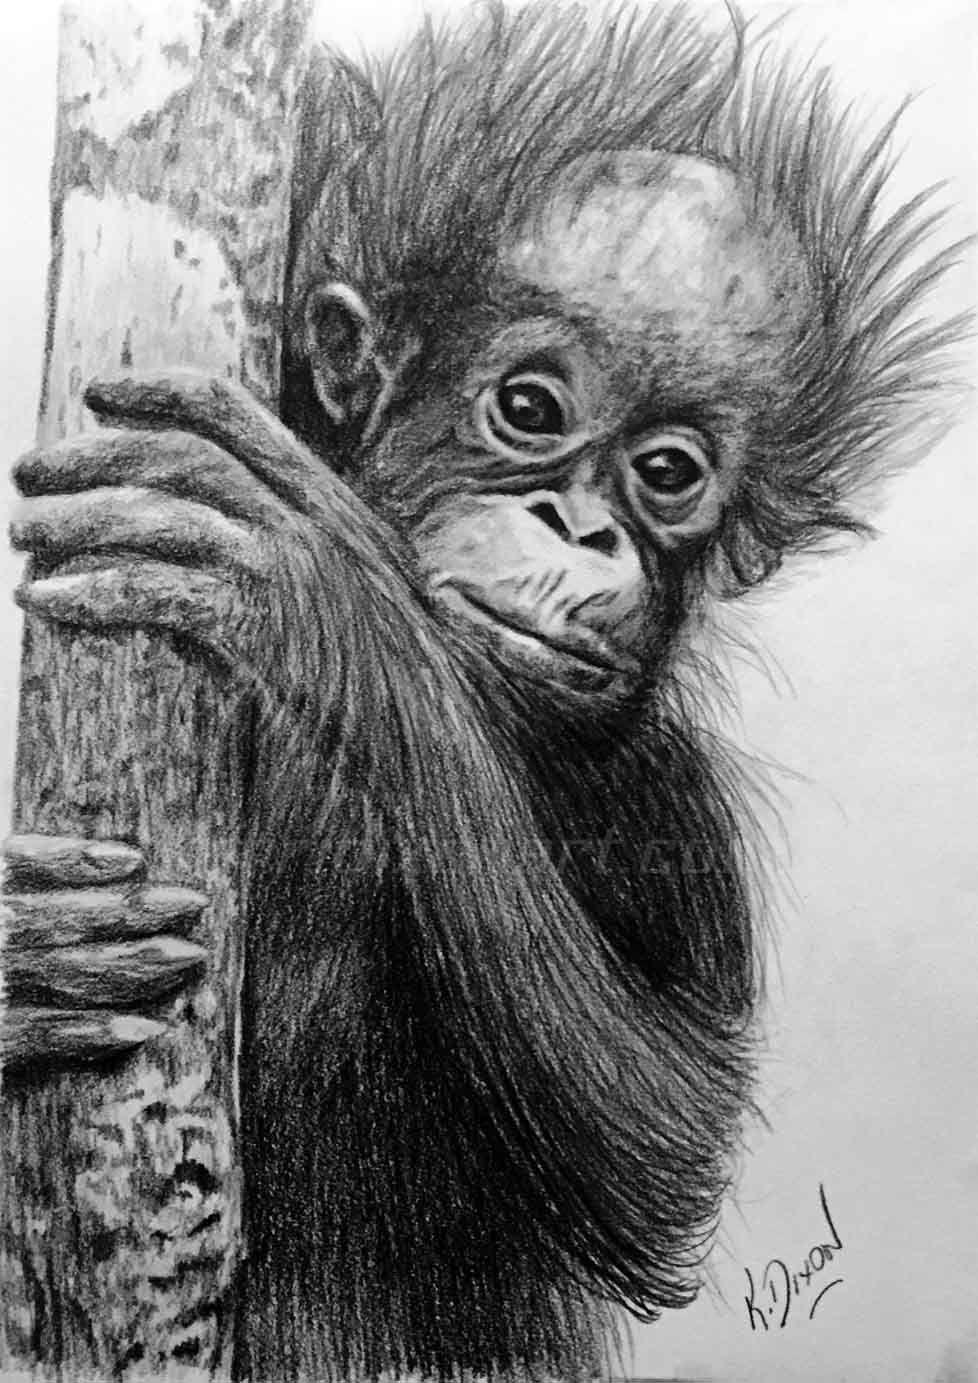 Uncategorized Orangutan Drawing baby orangutan in graphite pencil drawing orango tango fundraiser fundraiser